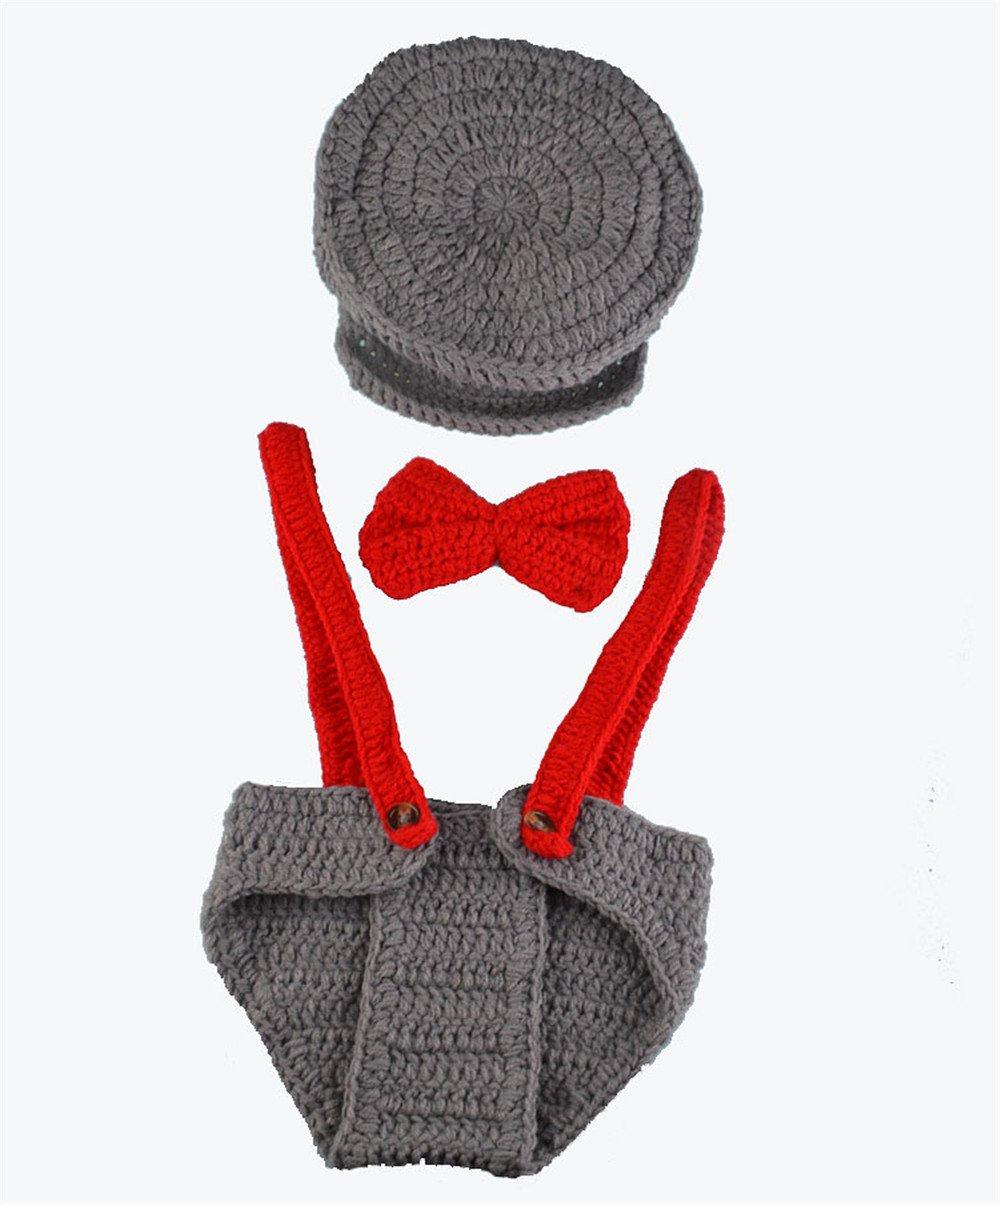 3pcs Baby set cappello + Tie + pantaloni pilota abbigliamento Handmade neonato bambina bambino fotog